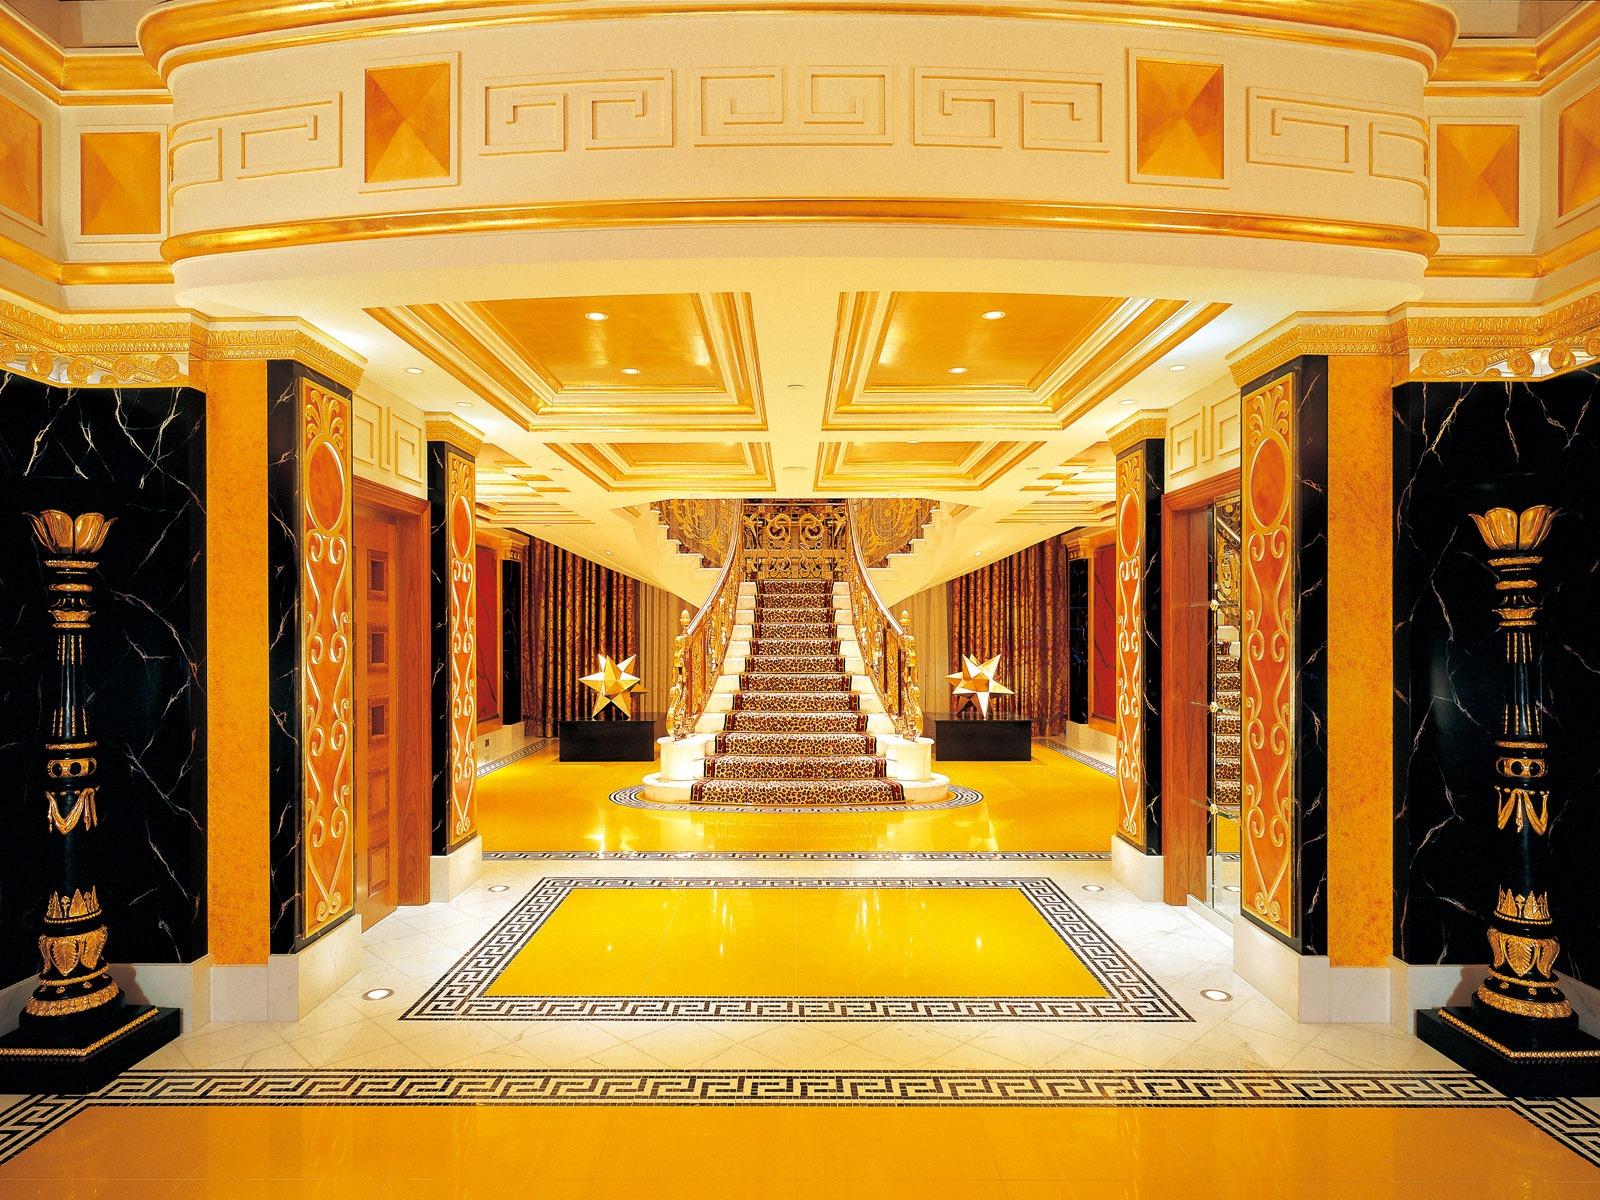 Seven star hotel burj dubai wallpapers 10 1600x1200 for Ten star hotel in dubai